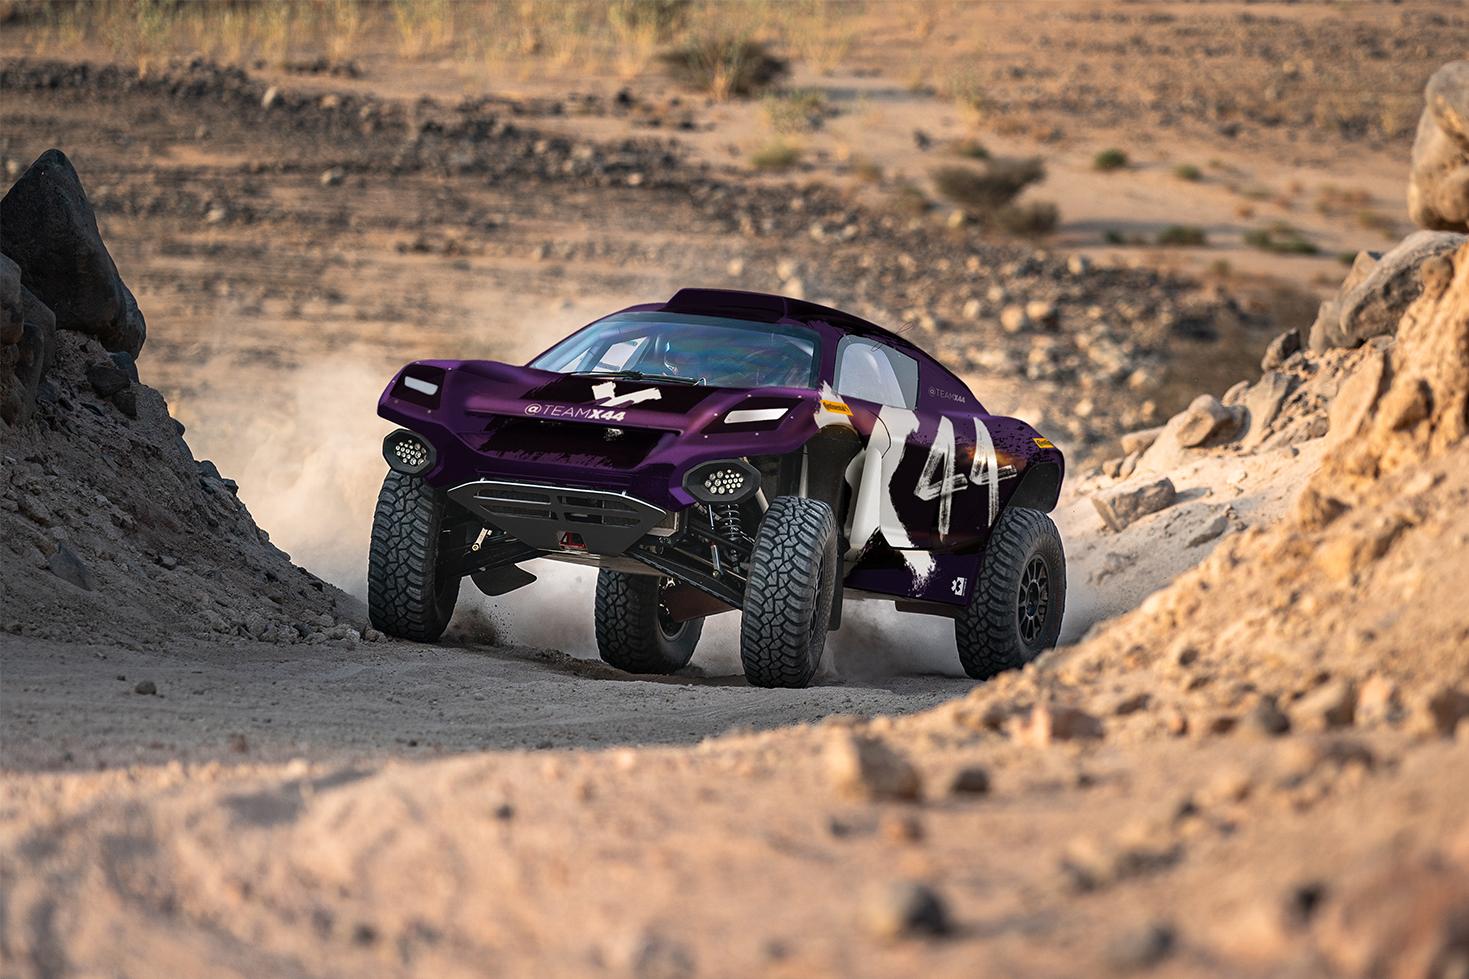 El equipo de Hamilton X44 competirá en Extreme E con este coche